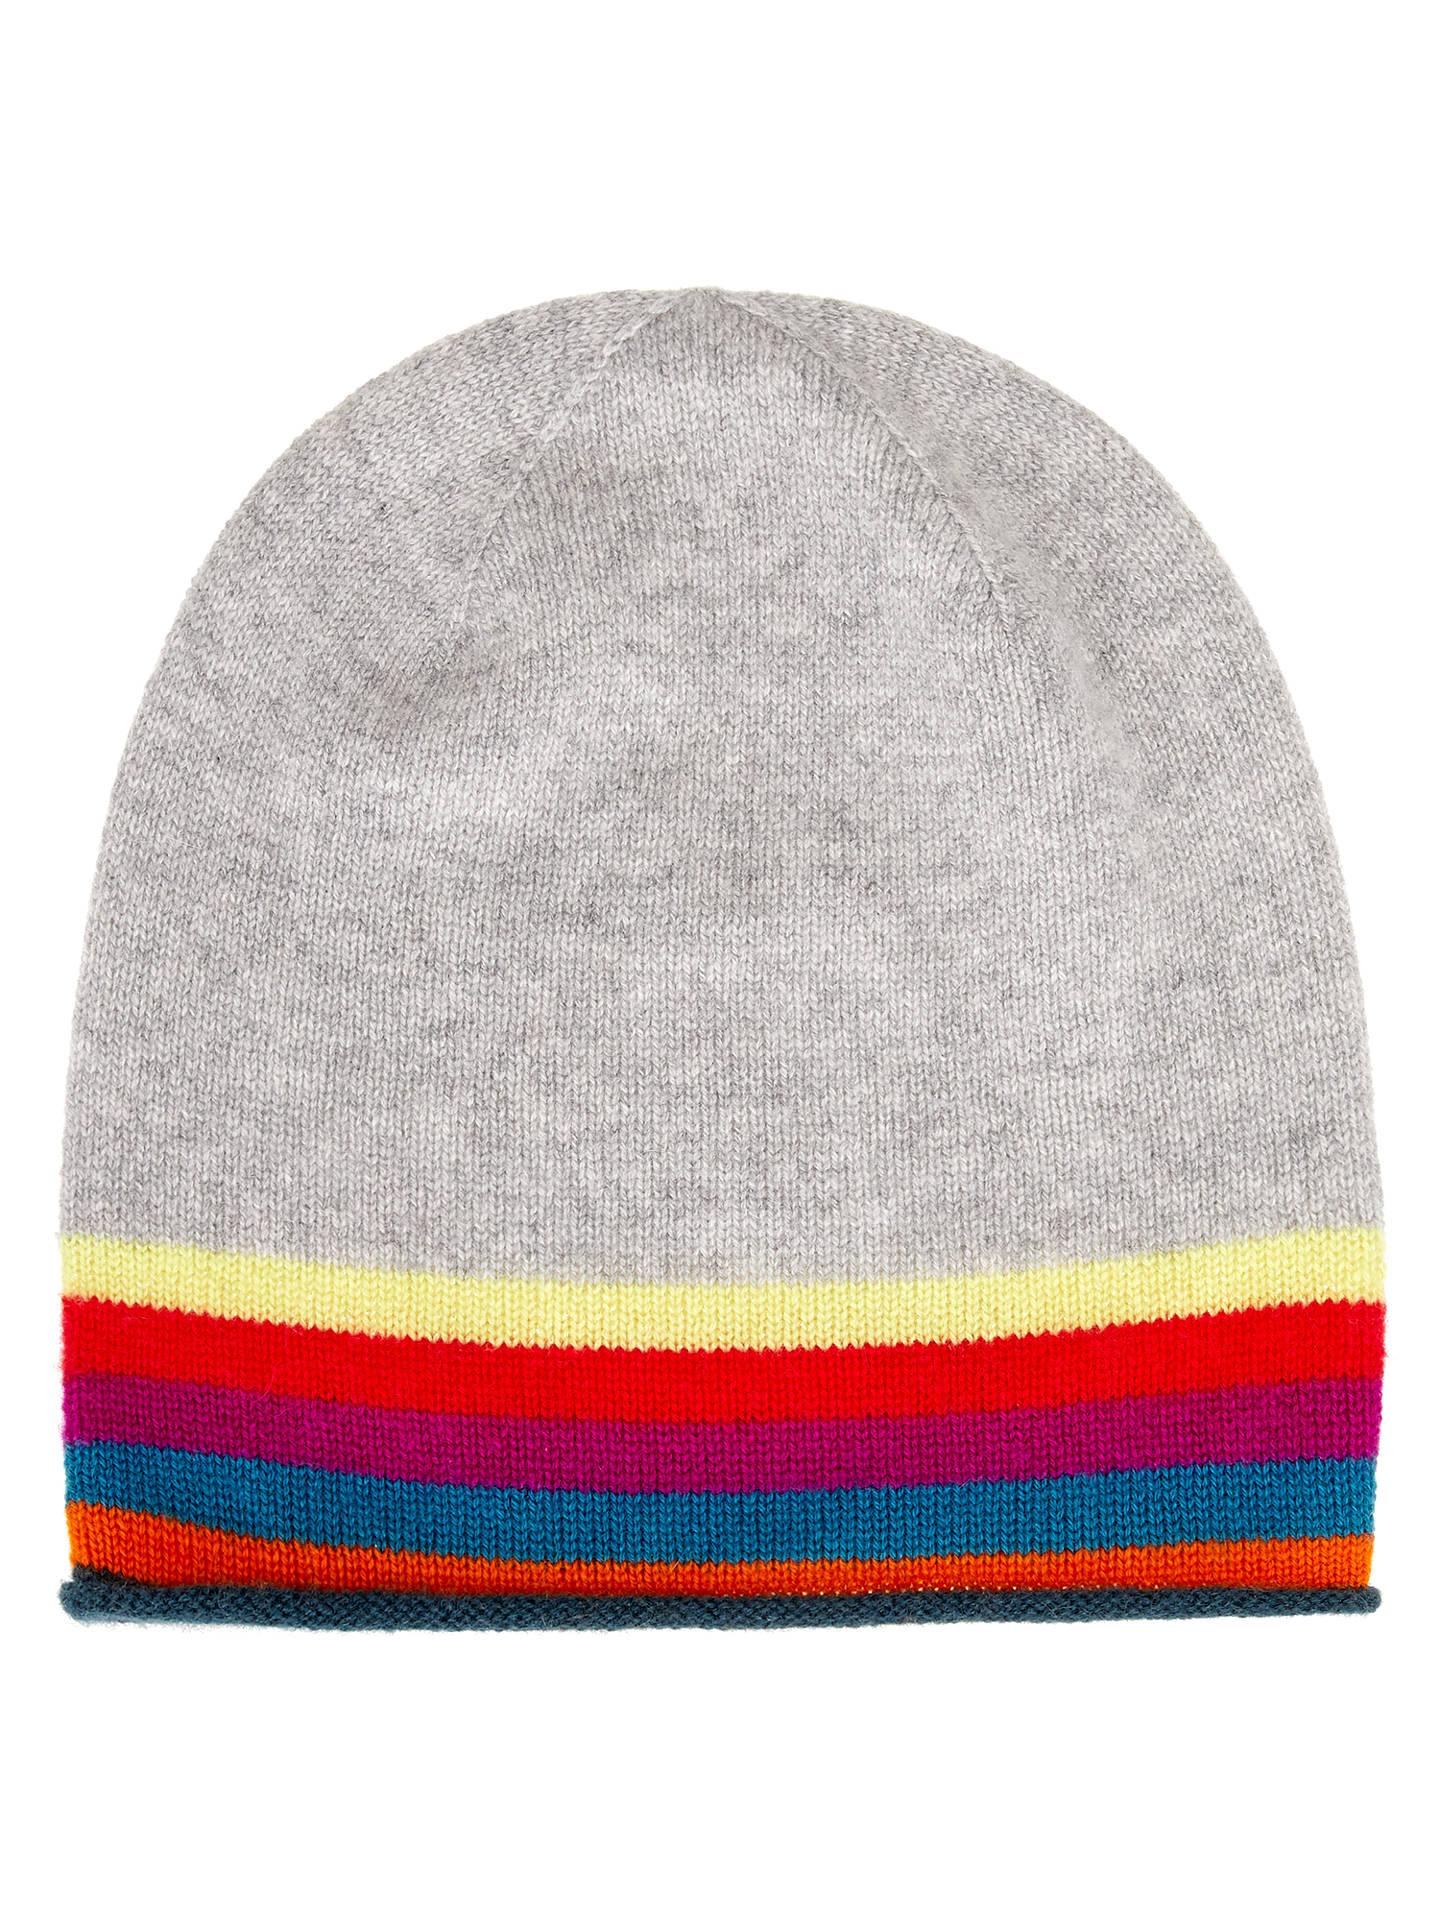 13cc5c11 Buy Wyse London Rainbow Stripe Cashmere Beanie, Grey Online at  johnlewis.com ...